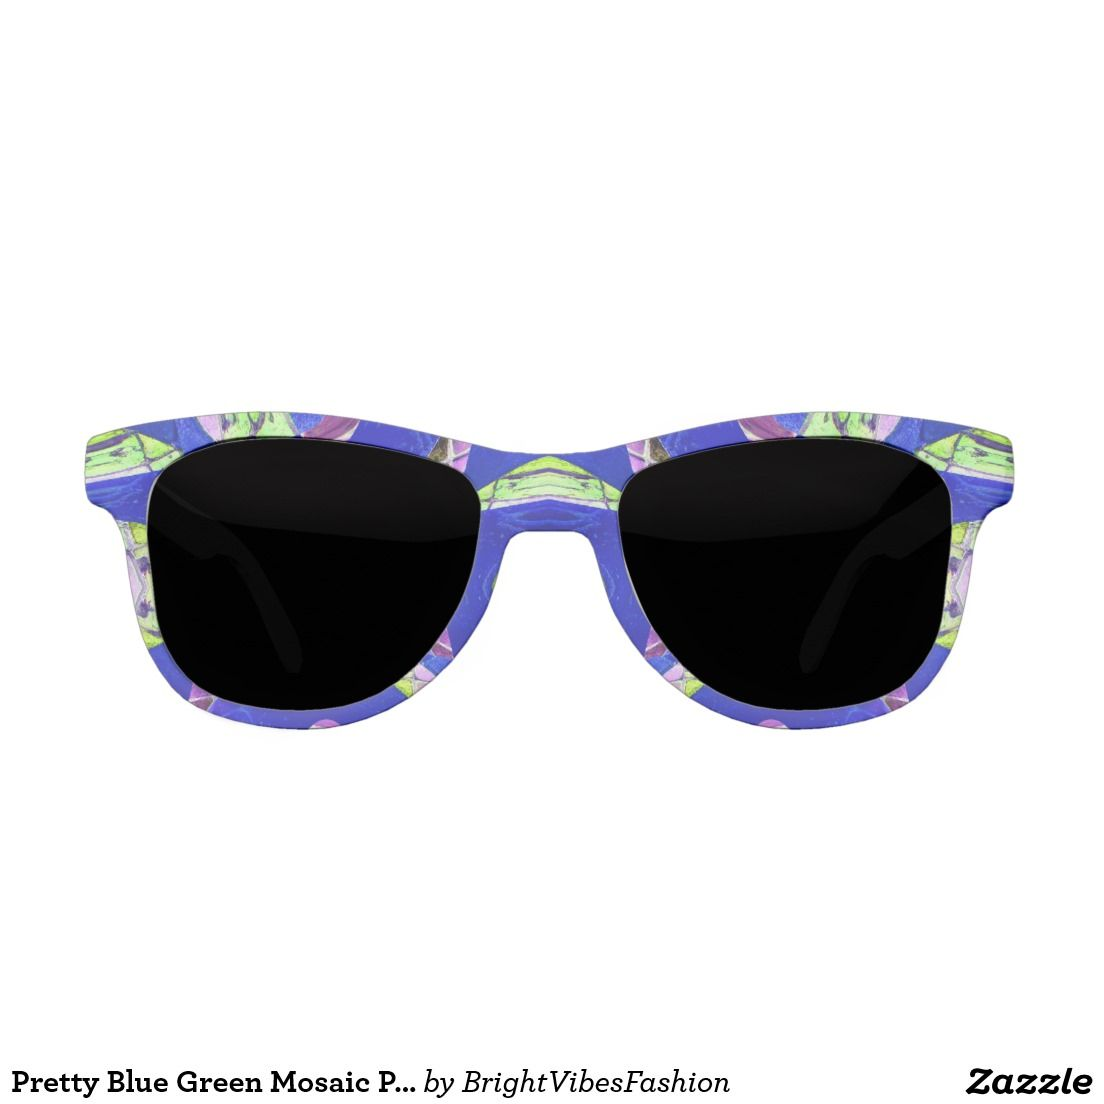 Pretty Blue Green Mosaic Pattern Sunglasses